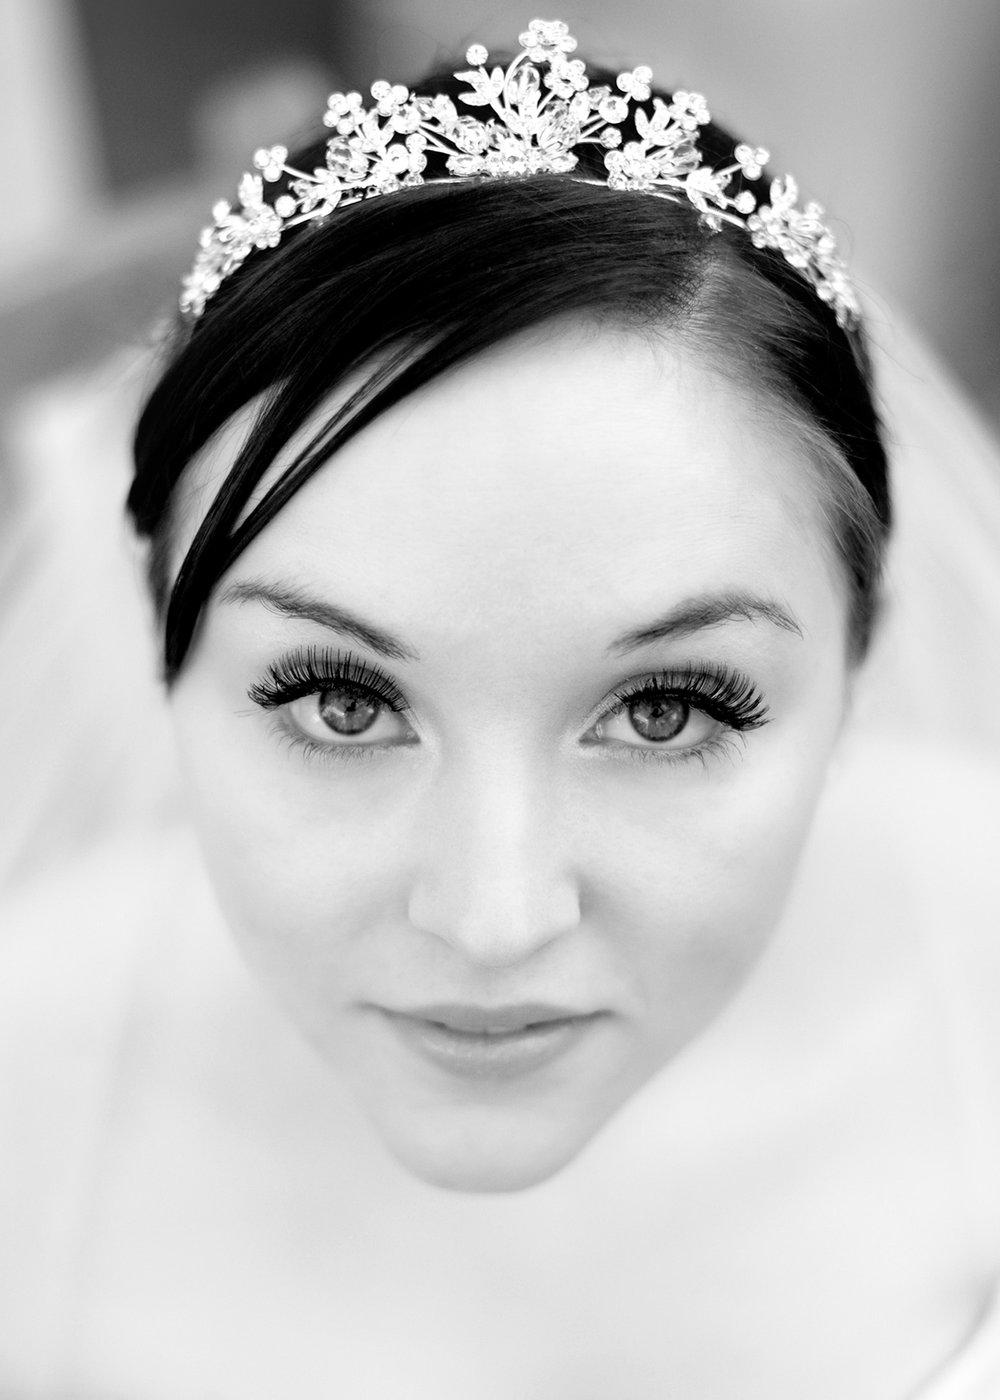 jma-photography-wedding-photographer-bride.jpg